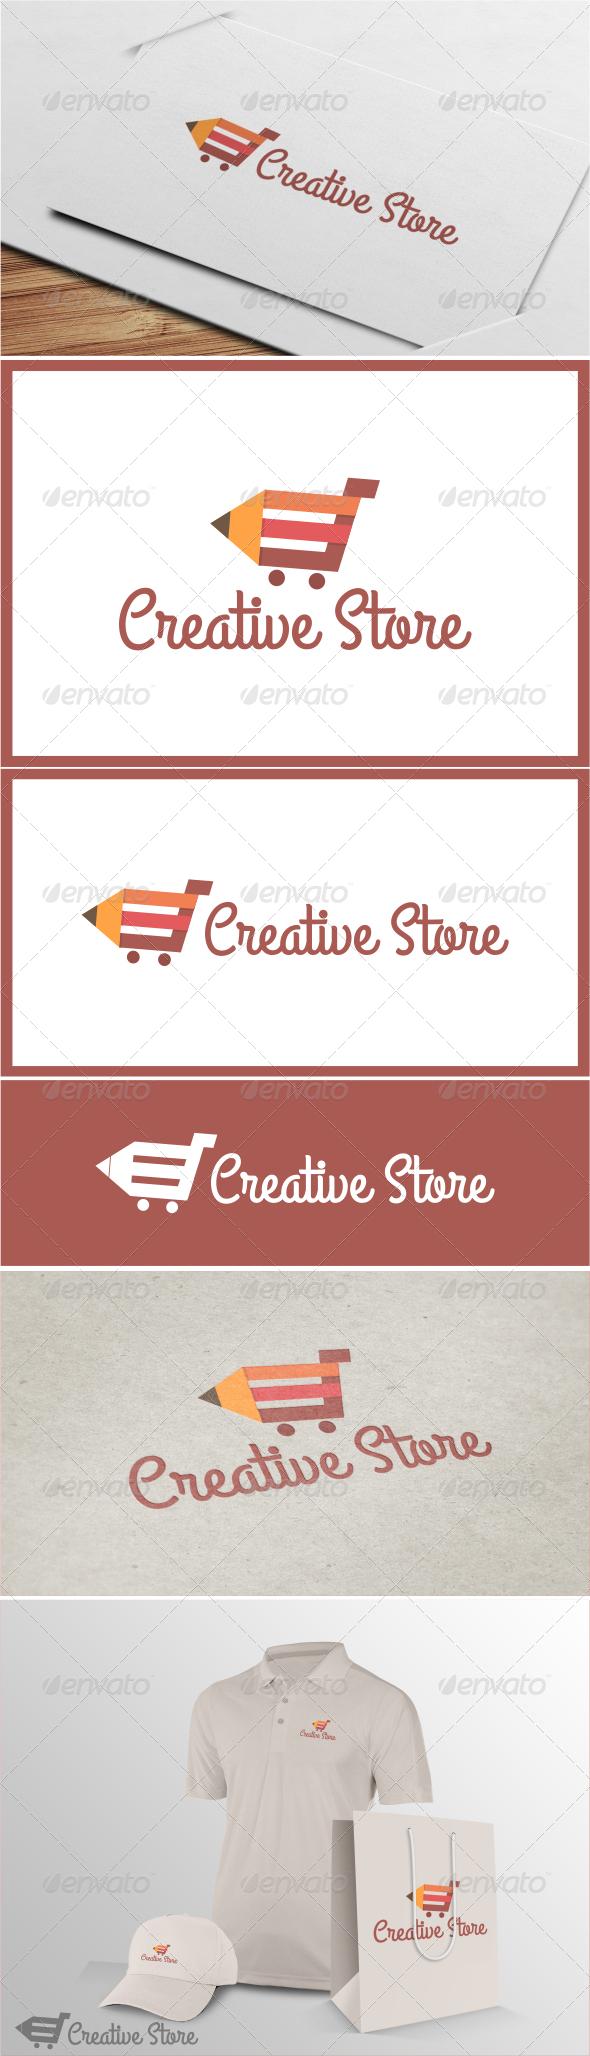 Creative Store Logo